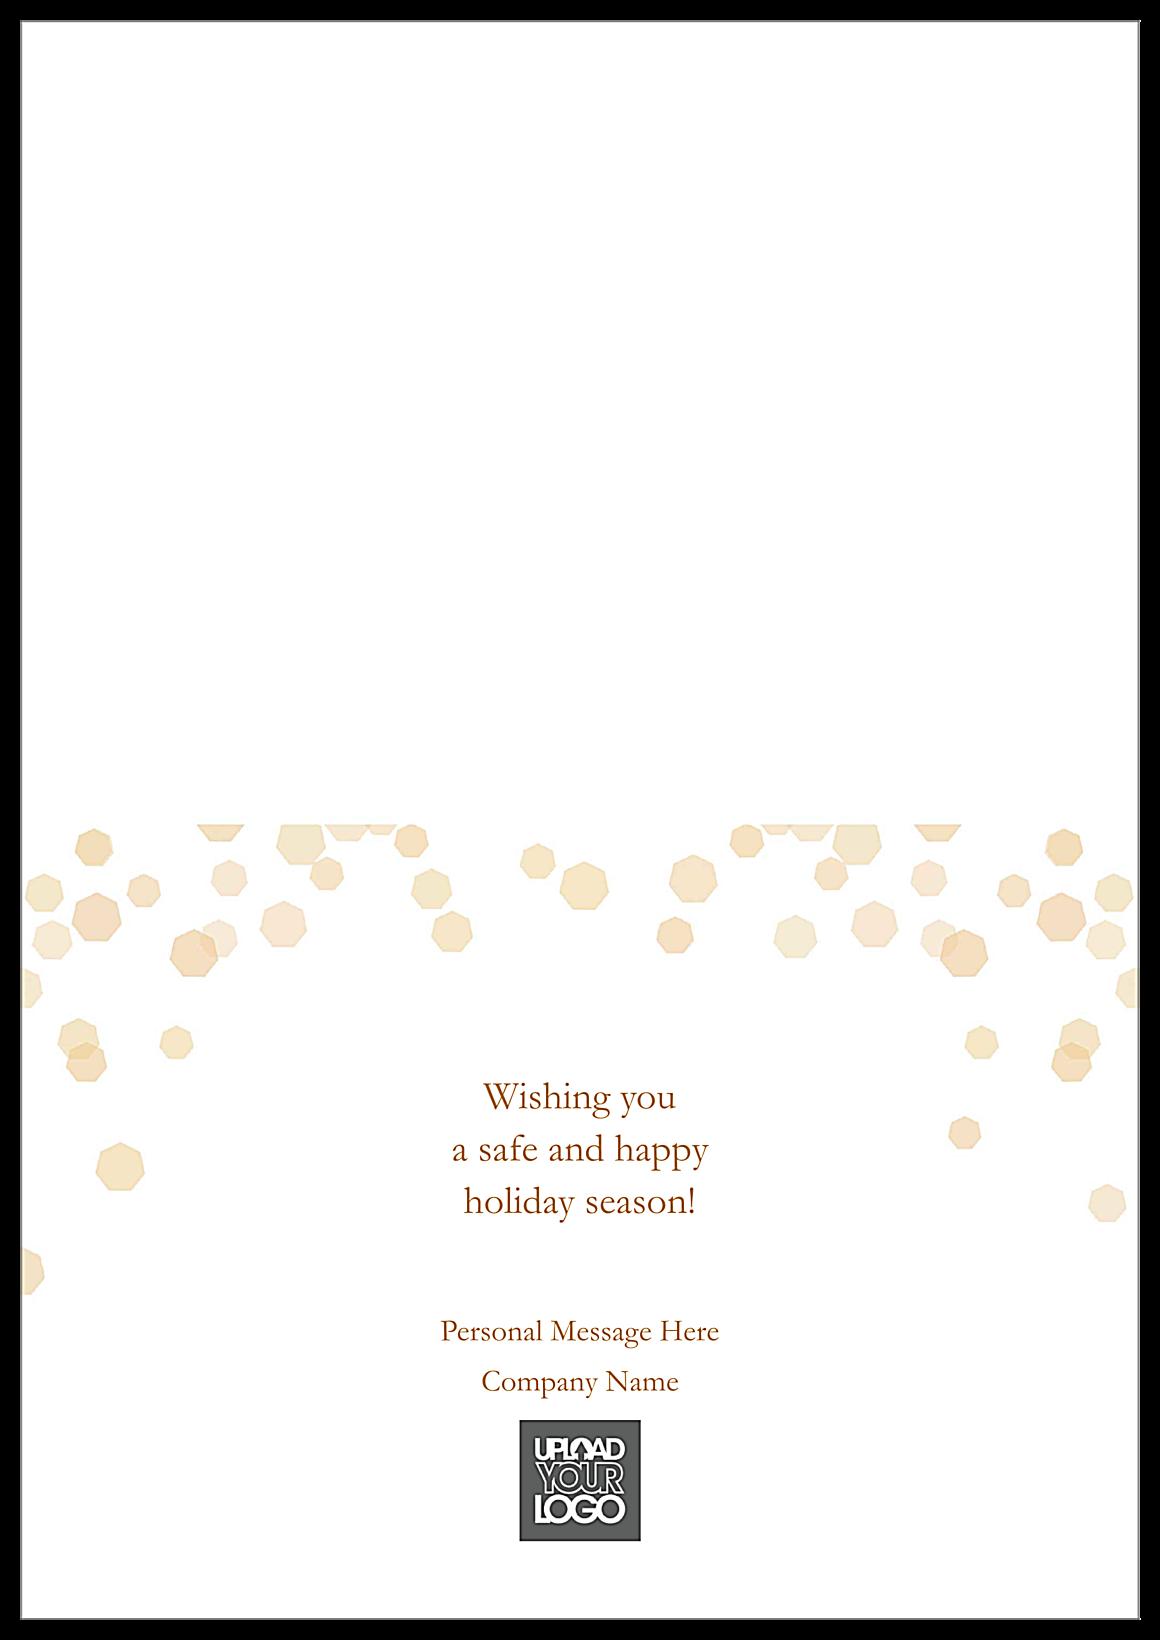 Golden Merry Christmas back - Greeting Cards Maker